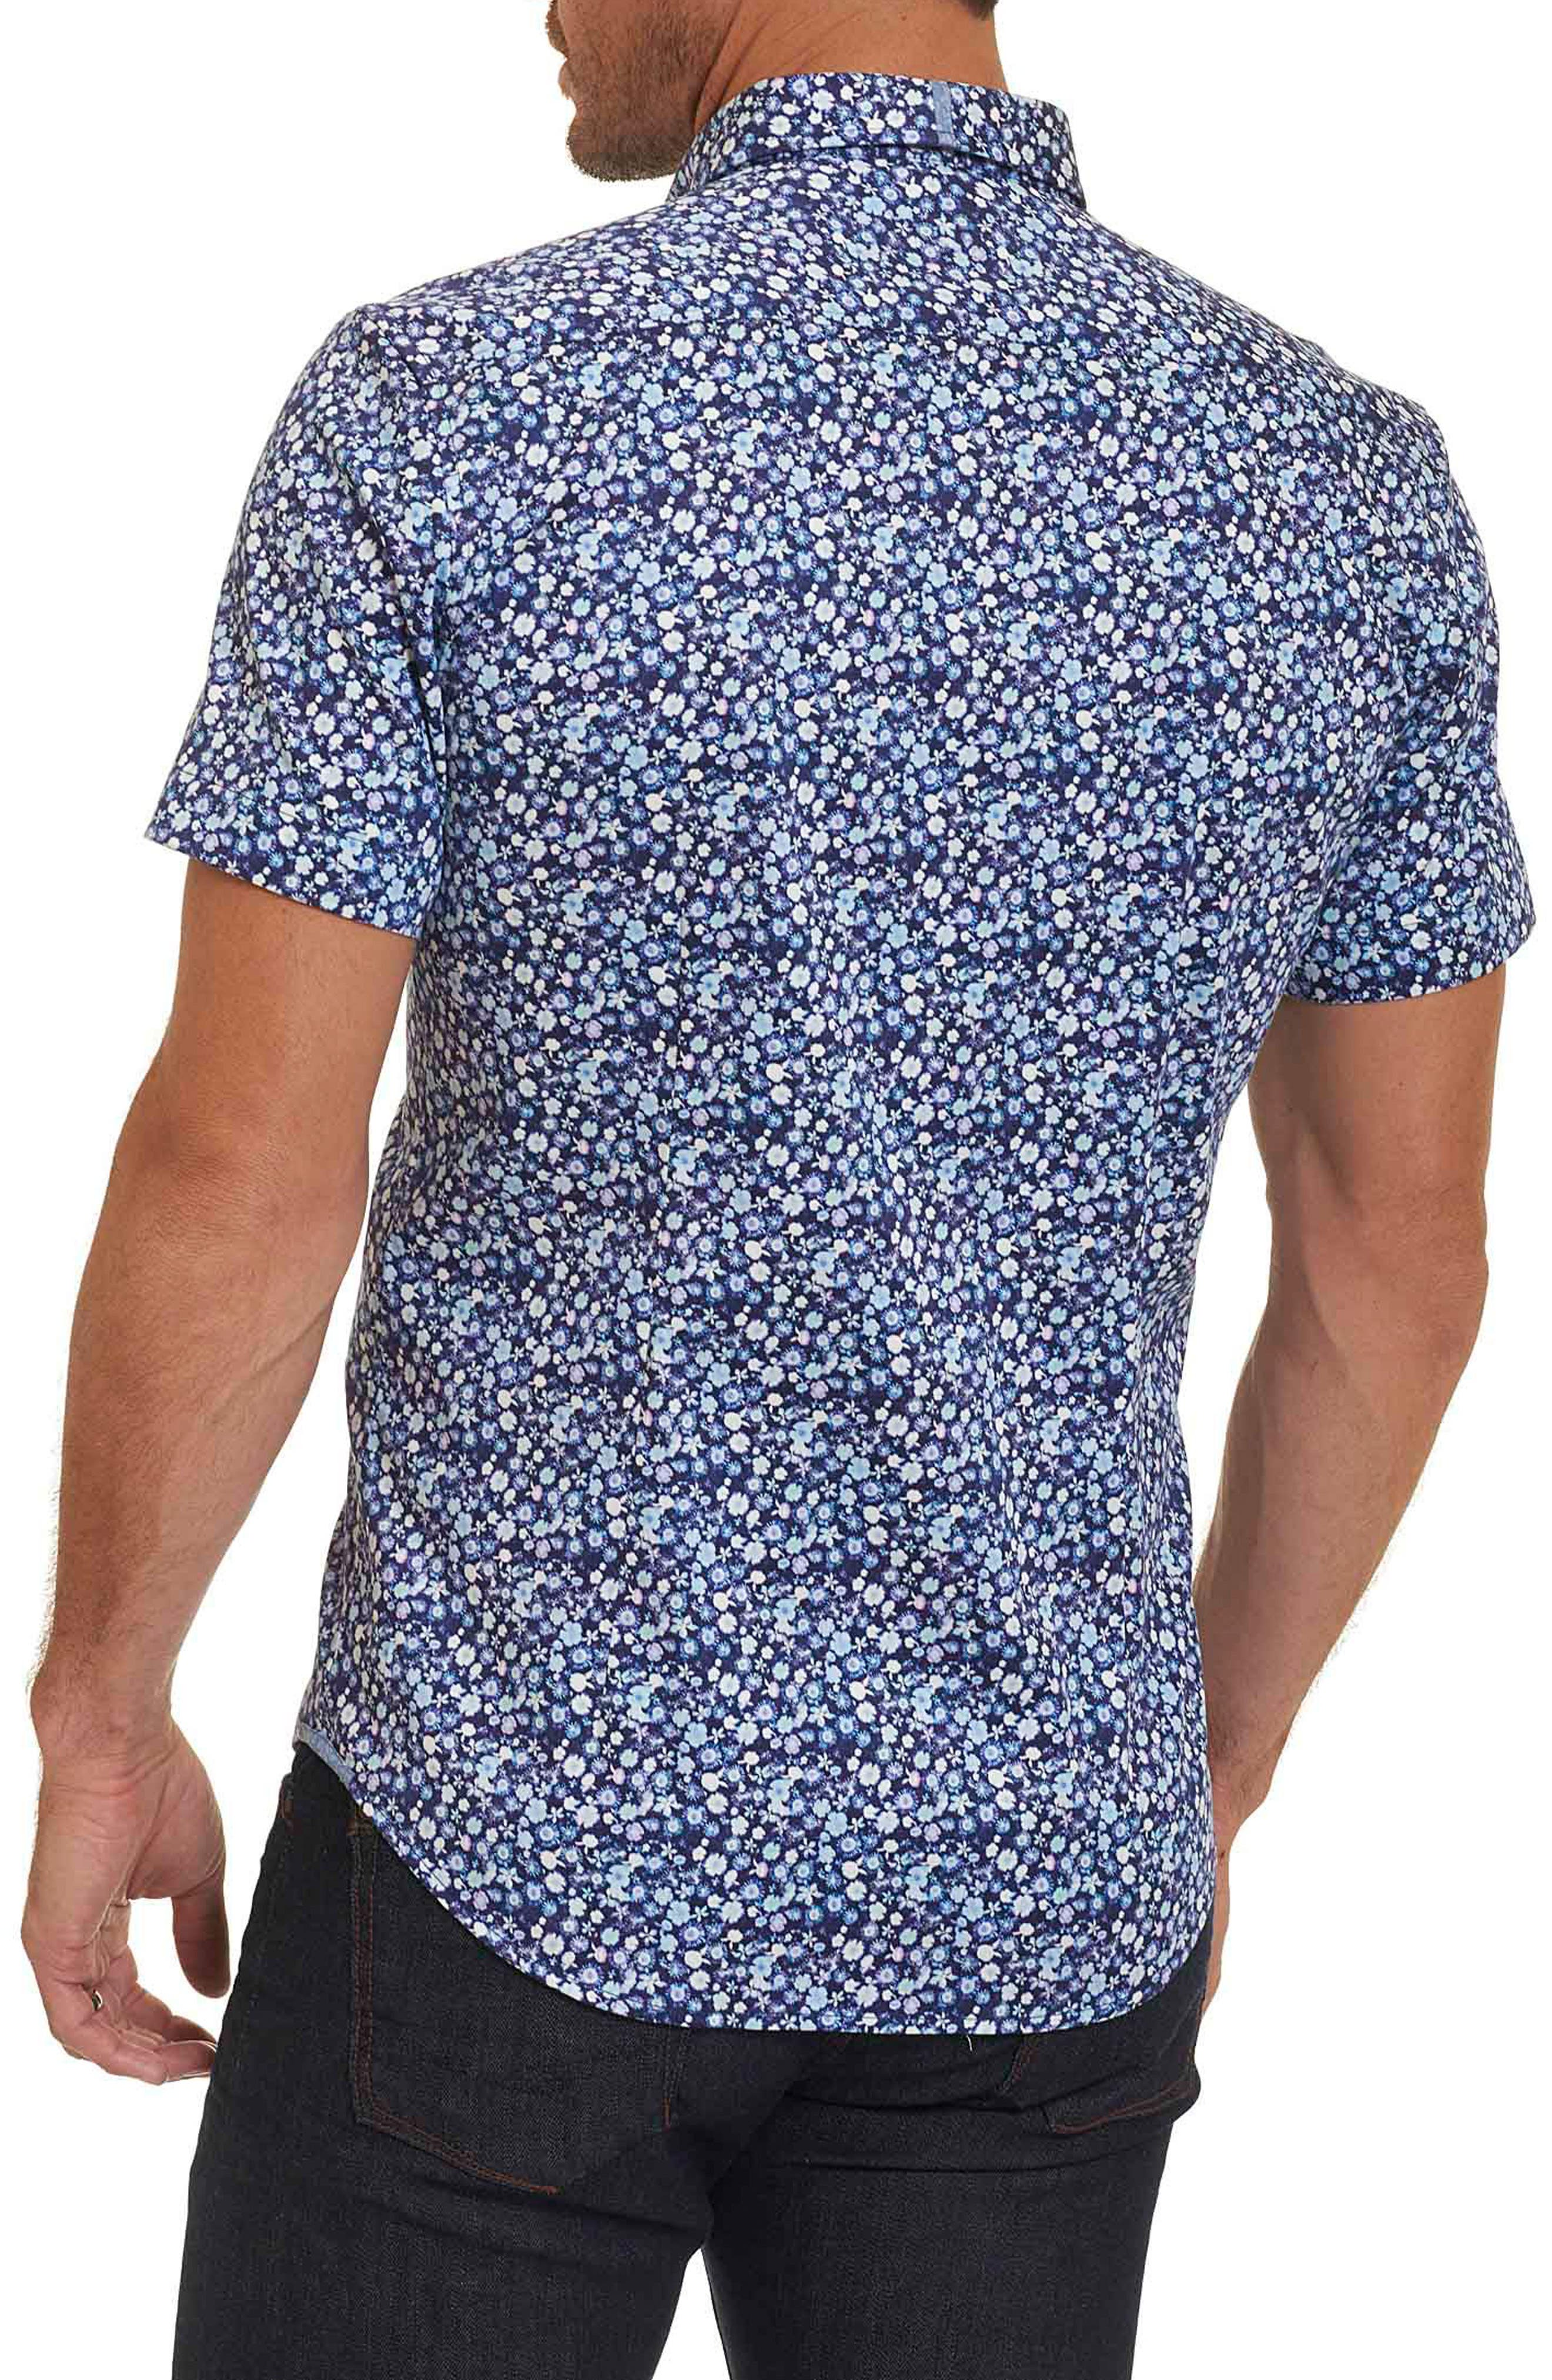 Bronson Tailored Fit Print Short Sleeve Sport Shirt,                             Alternate thumbnail 2, color,                             Blue